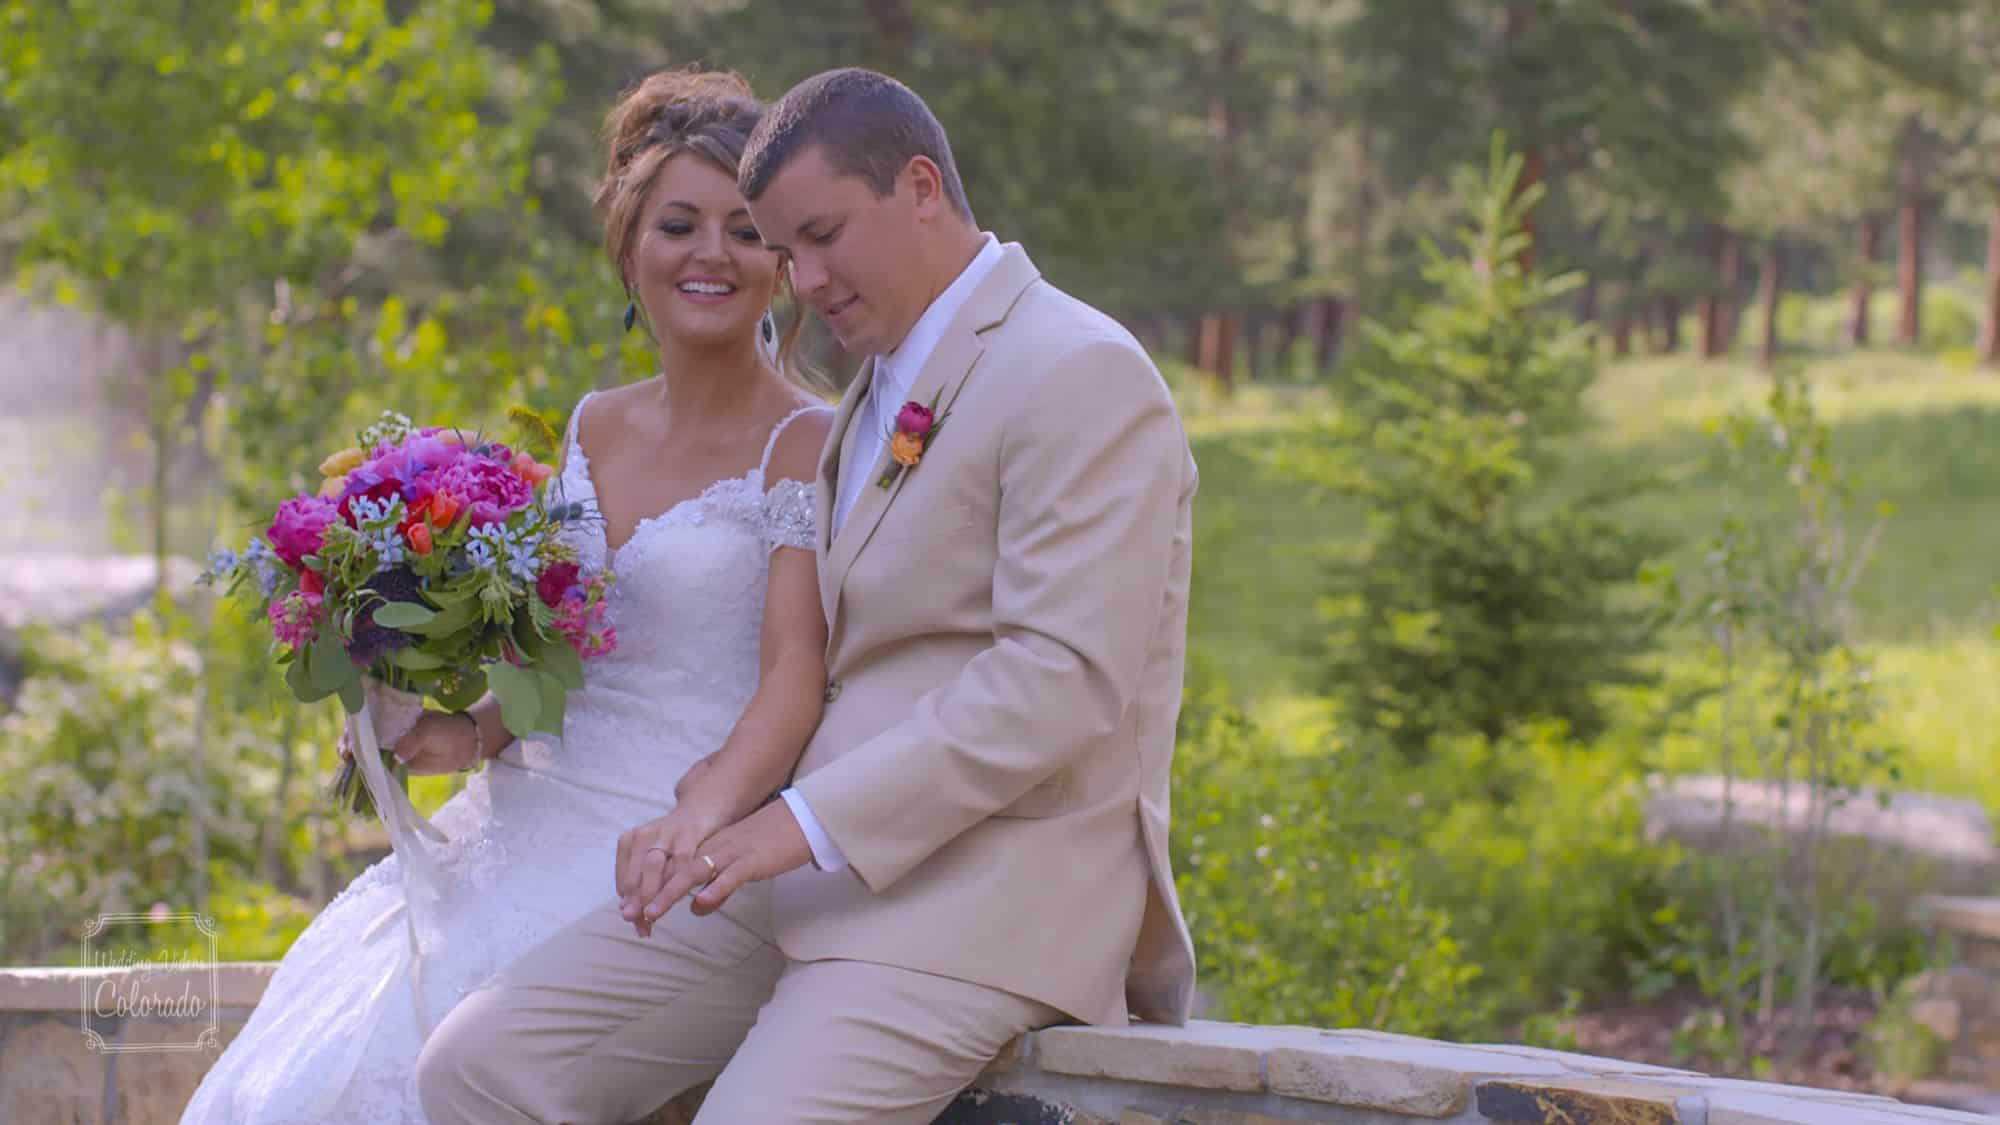 Jarrell-Wiese Della Terra wedding